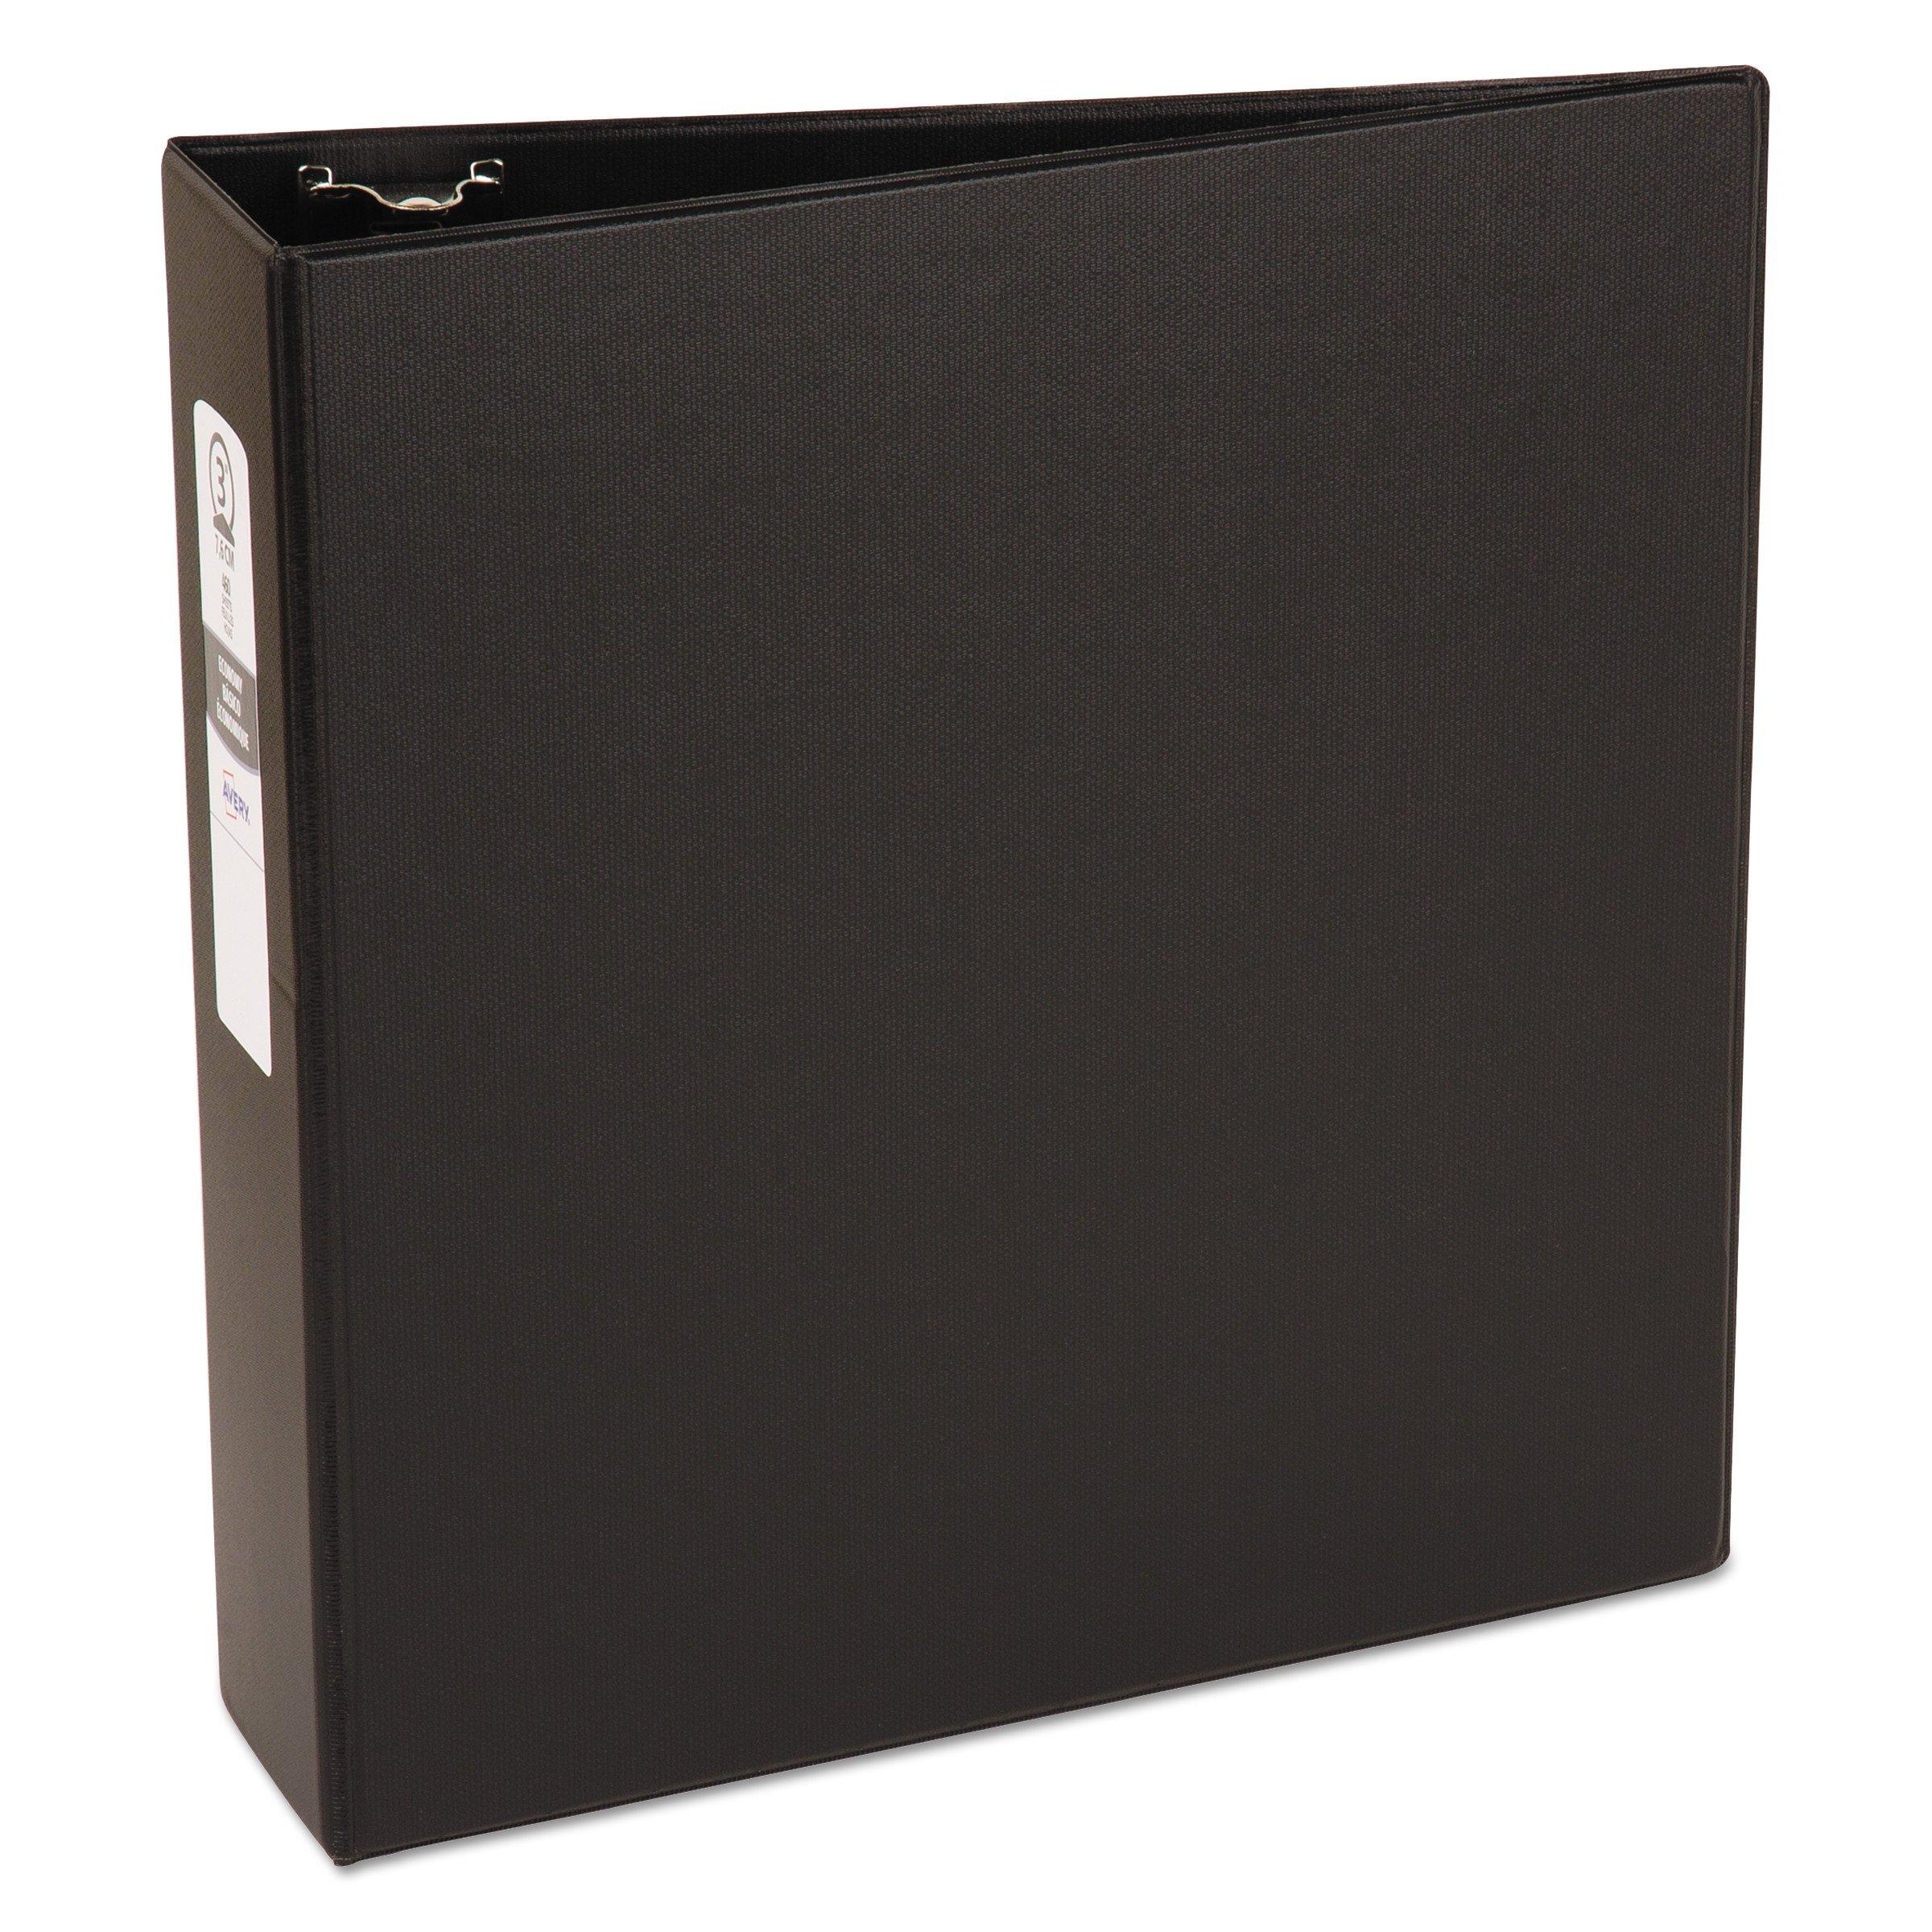 Avery Economy Binder, 3'' Round Rings, 460-Sheet Capacity, Black (03602)